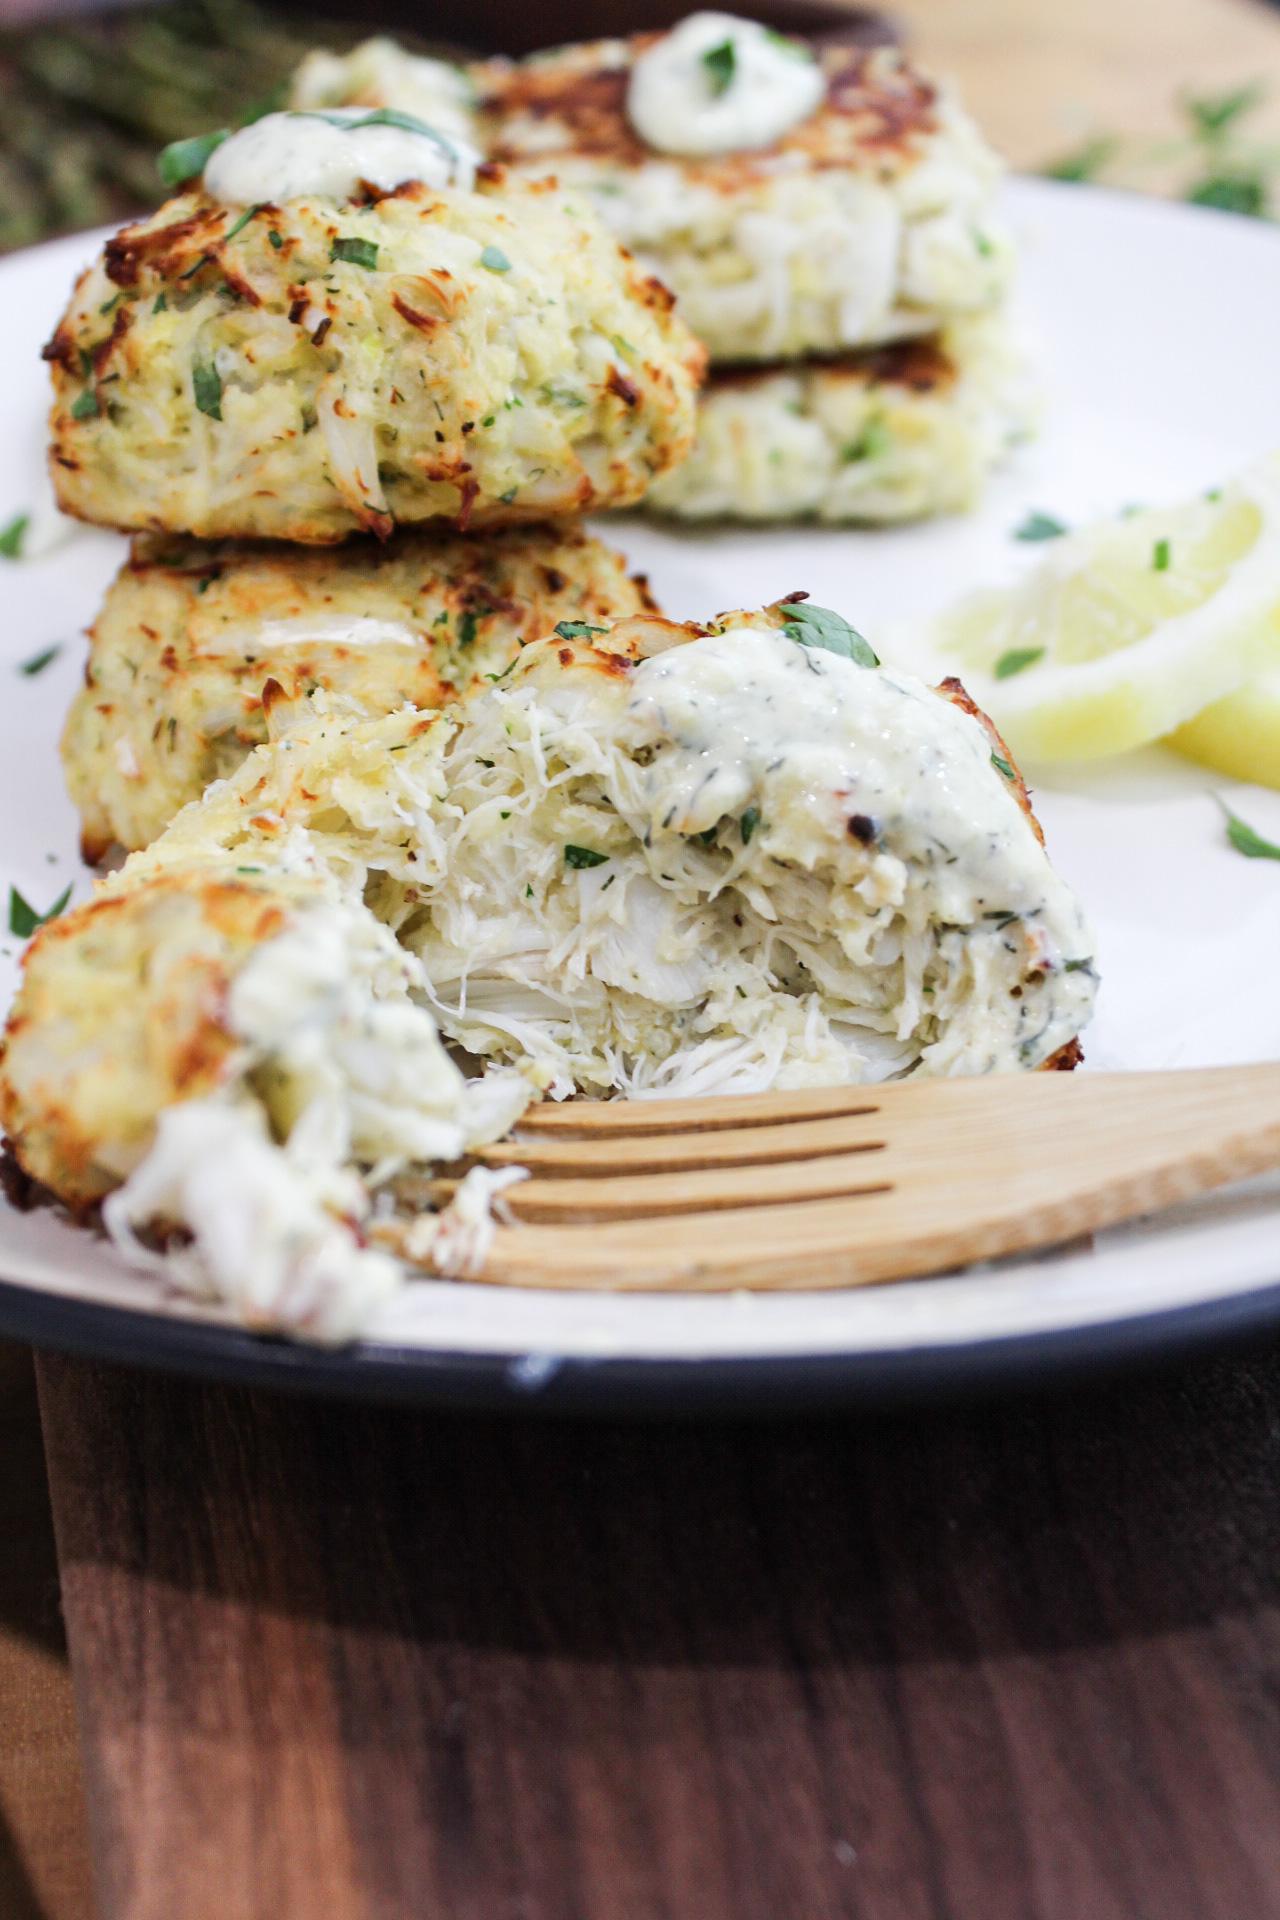 Crab Cakes with Lemon Dill Yogurt Sauce